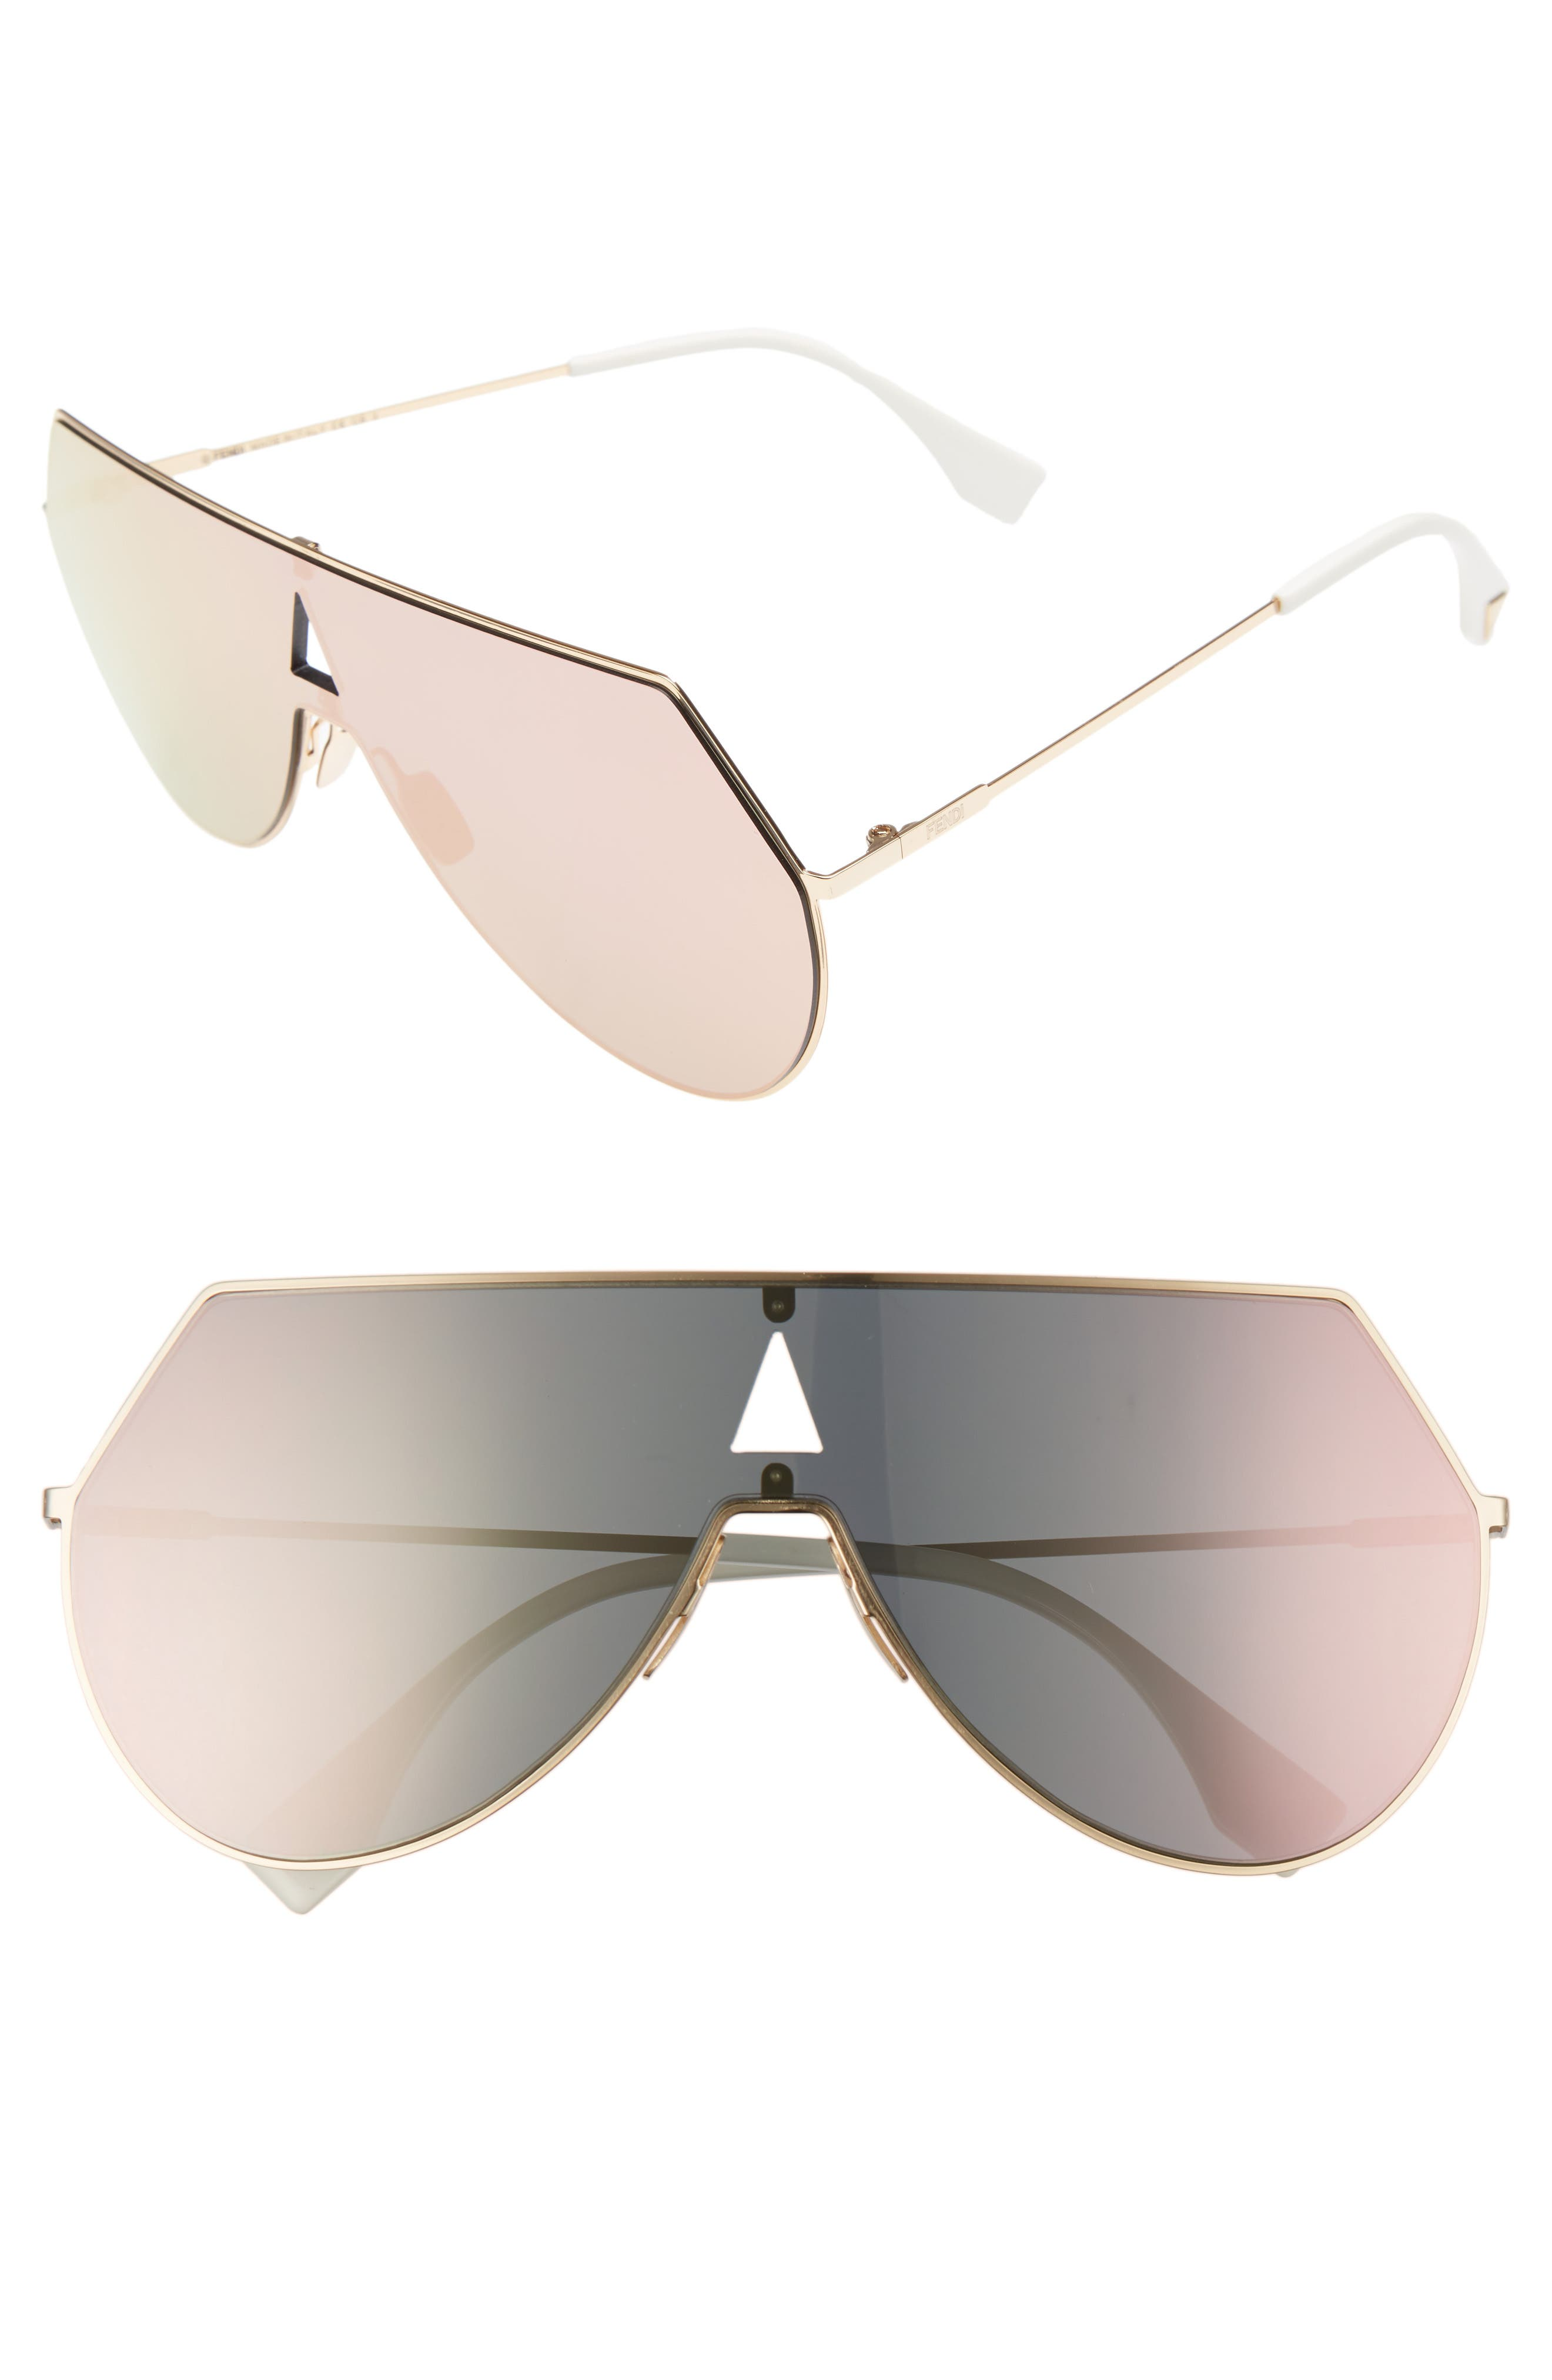 99mm Eyeline Aviator Sunglasses,                             Main thumbnail 1, color,                             ROSE GOLD